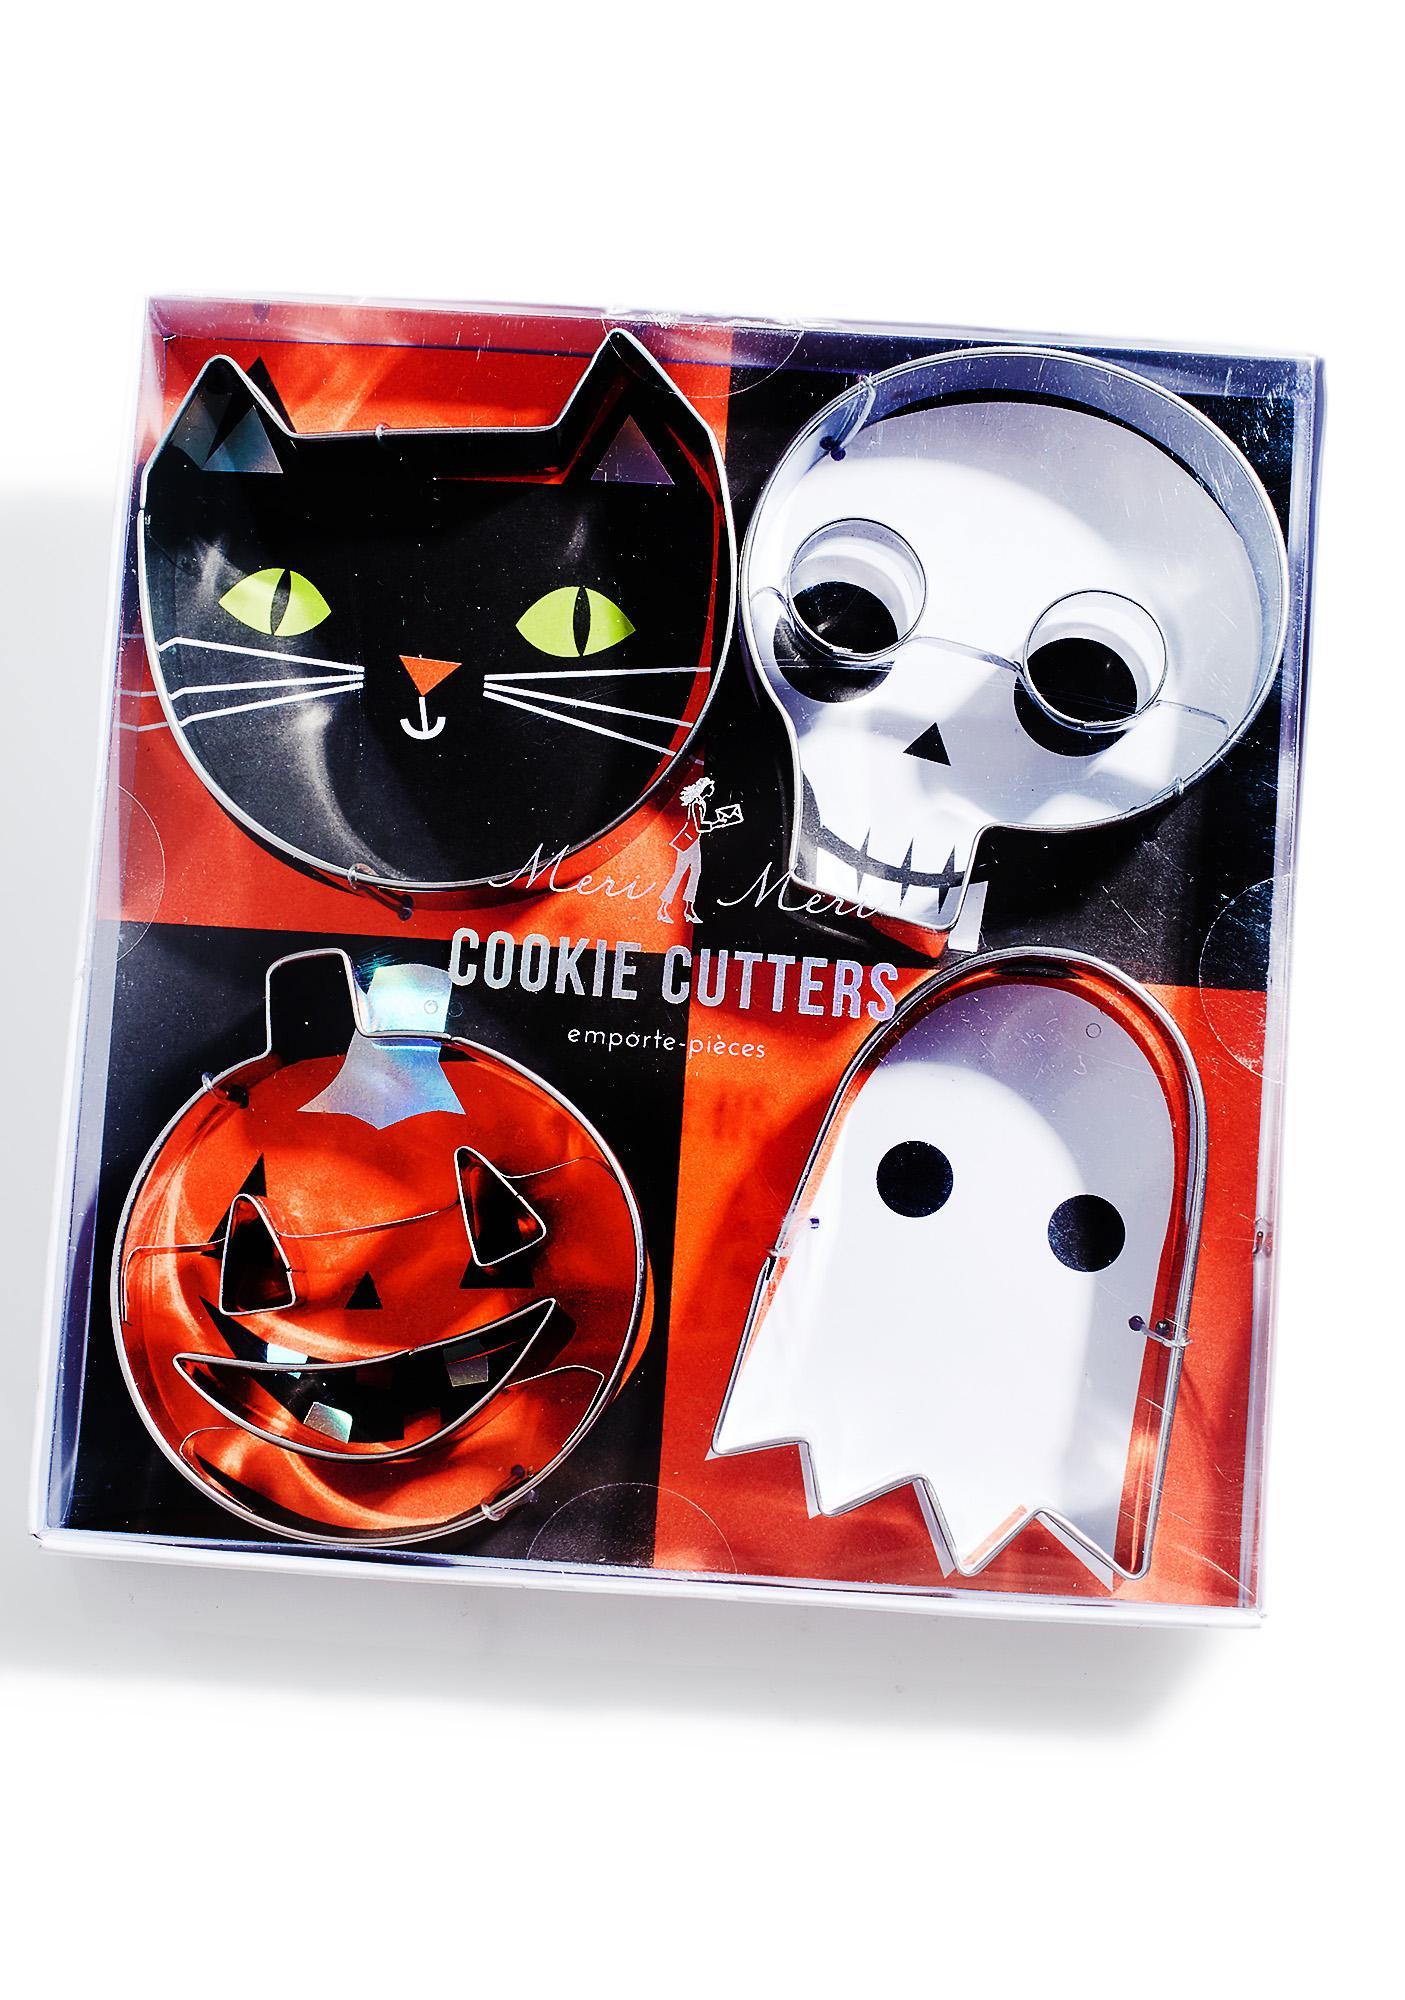 Supa Spooky Cookie Cutters